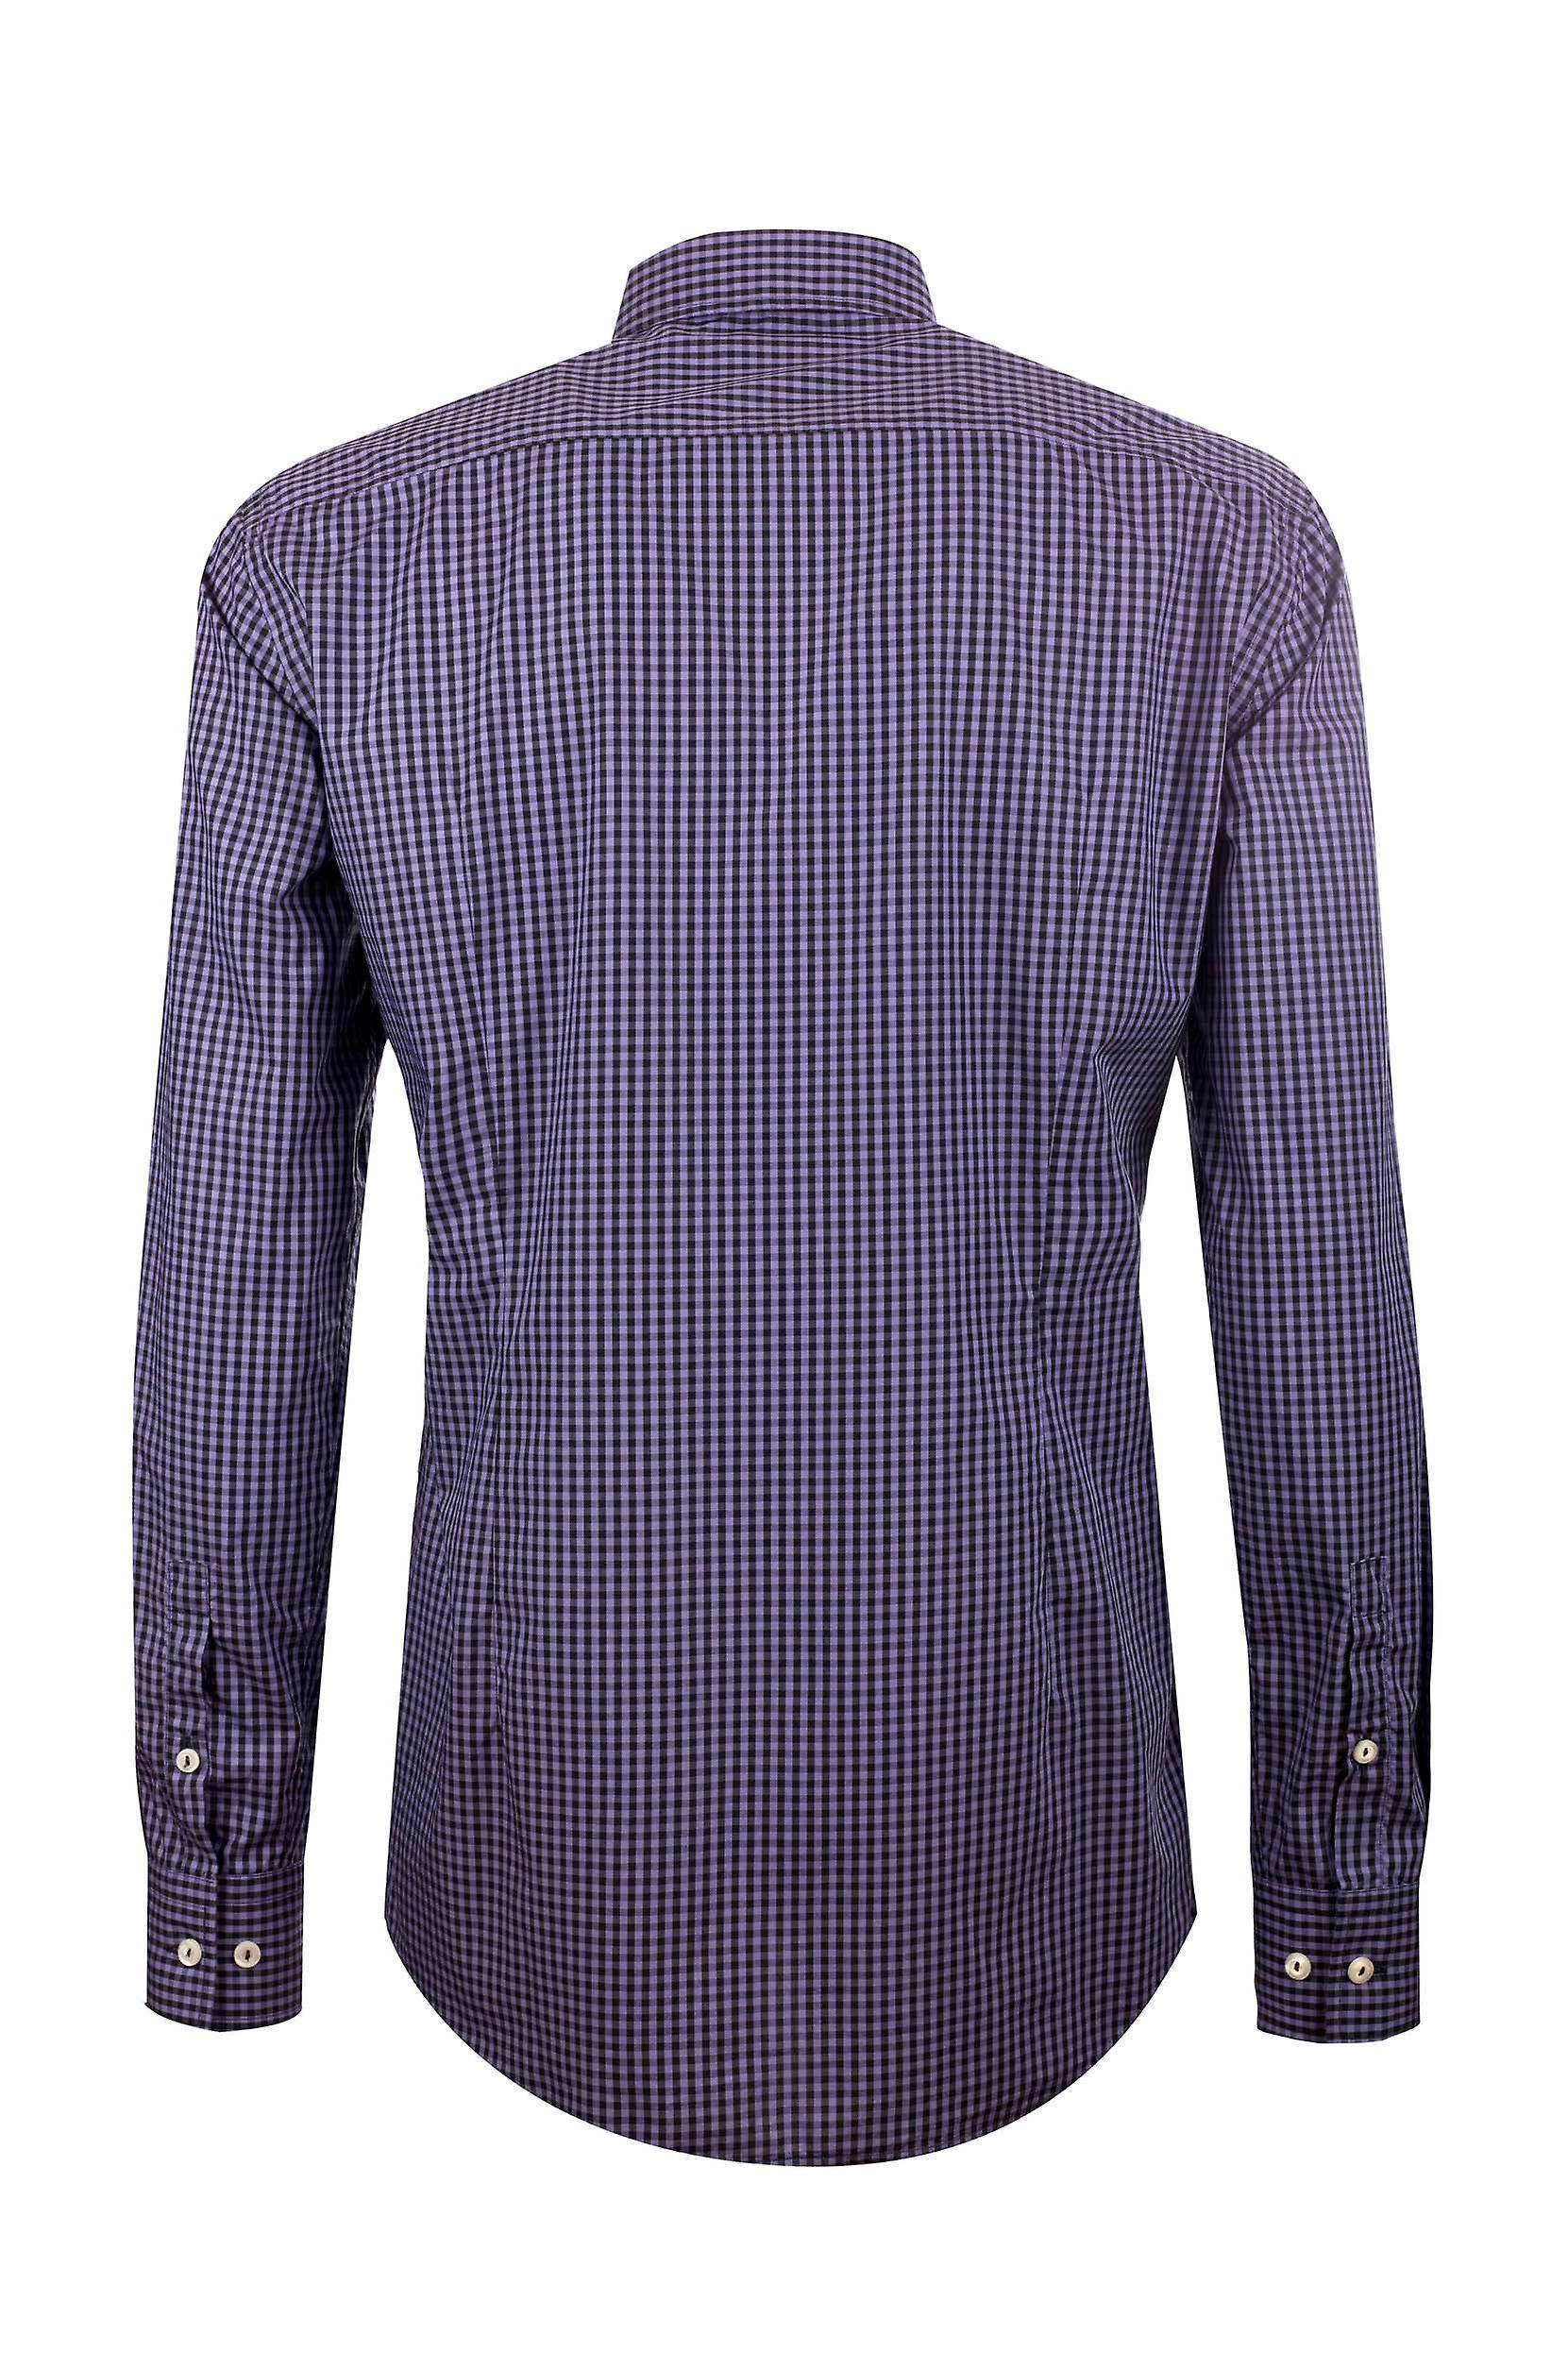 Fabio Giovanni Augusto Shirt - High Quality Italian Poplin Cotton Grey & Black Check Shirt